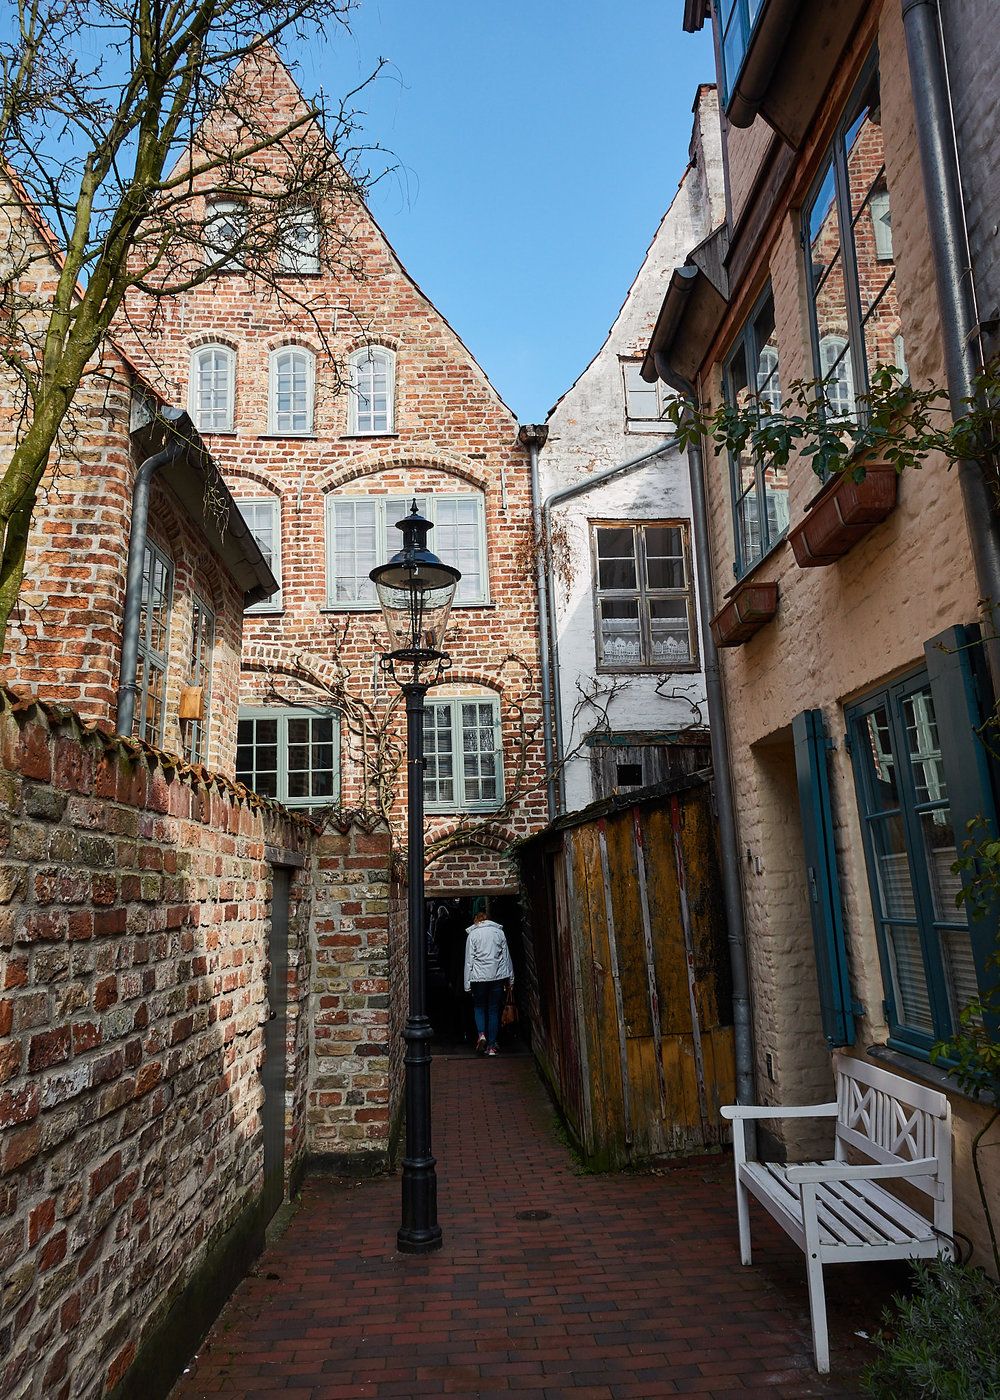 20190330-Lübeck-323.jpg